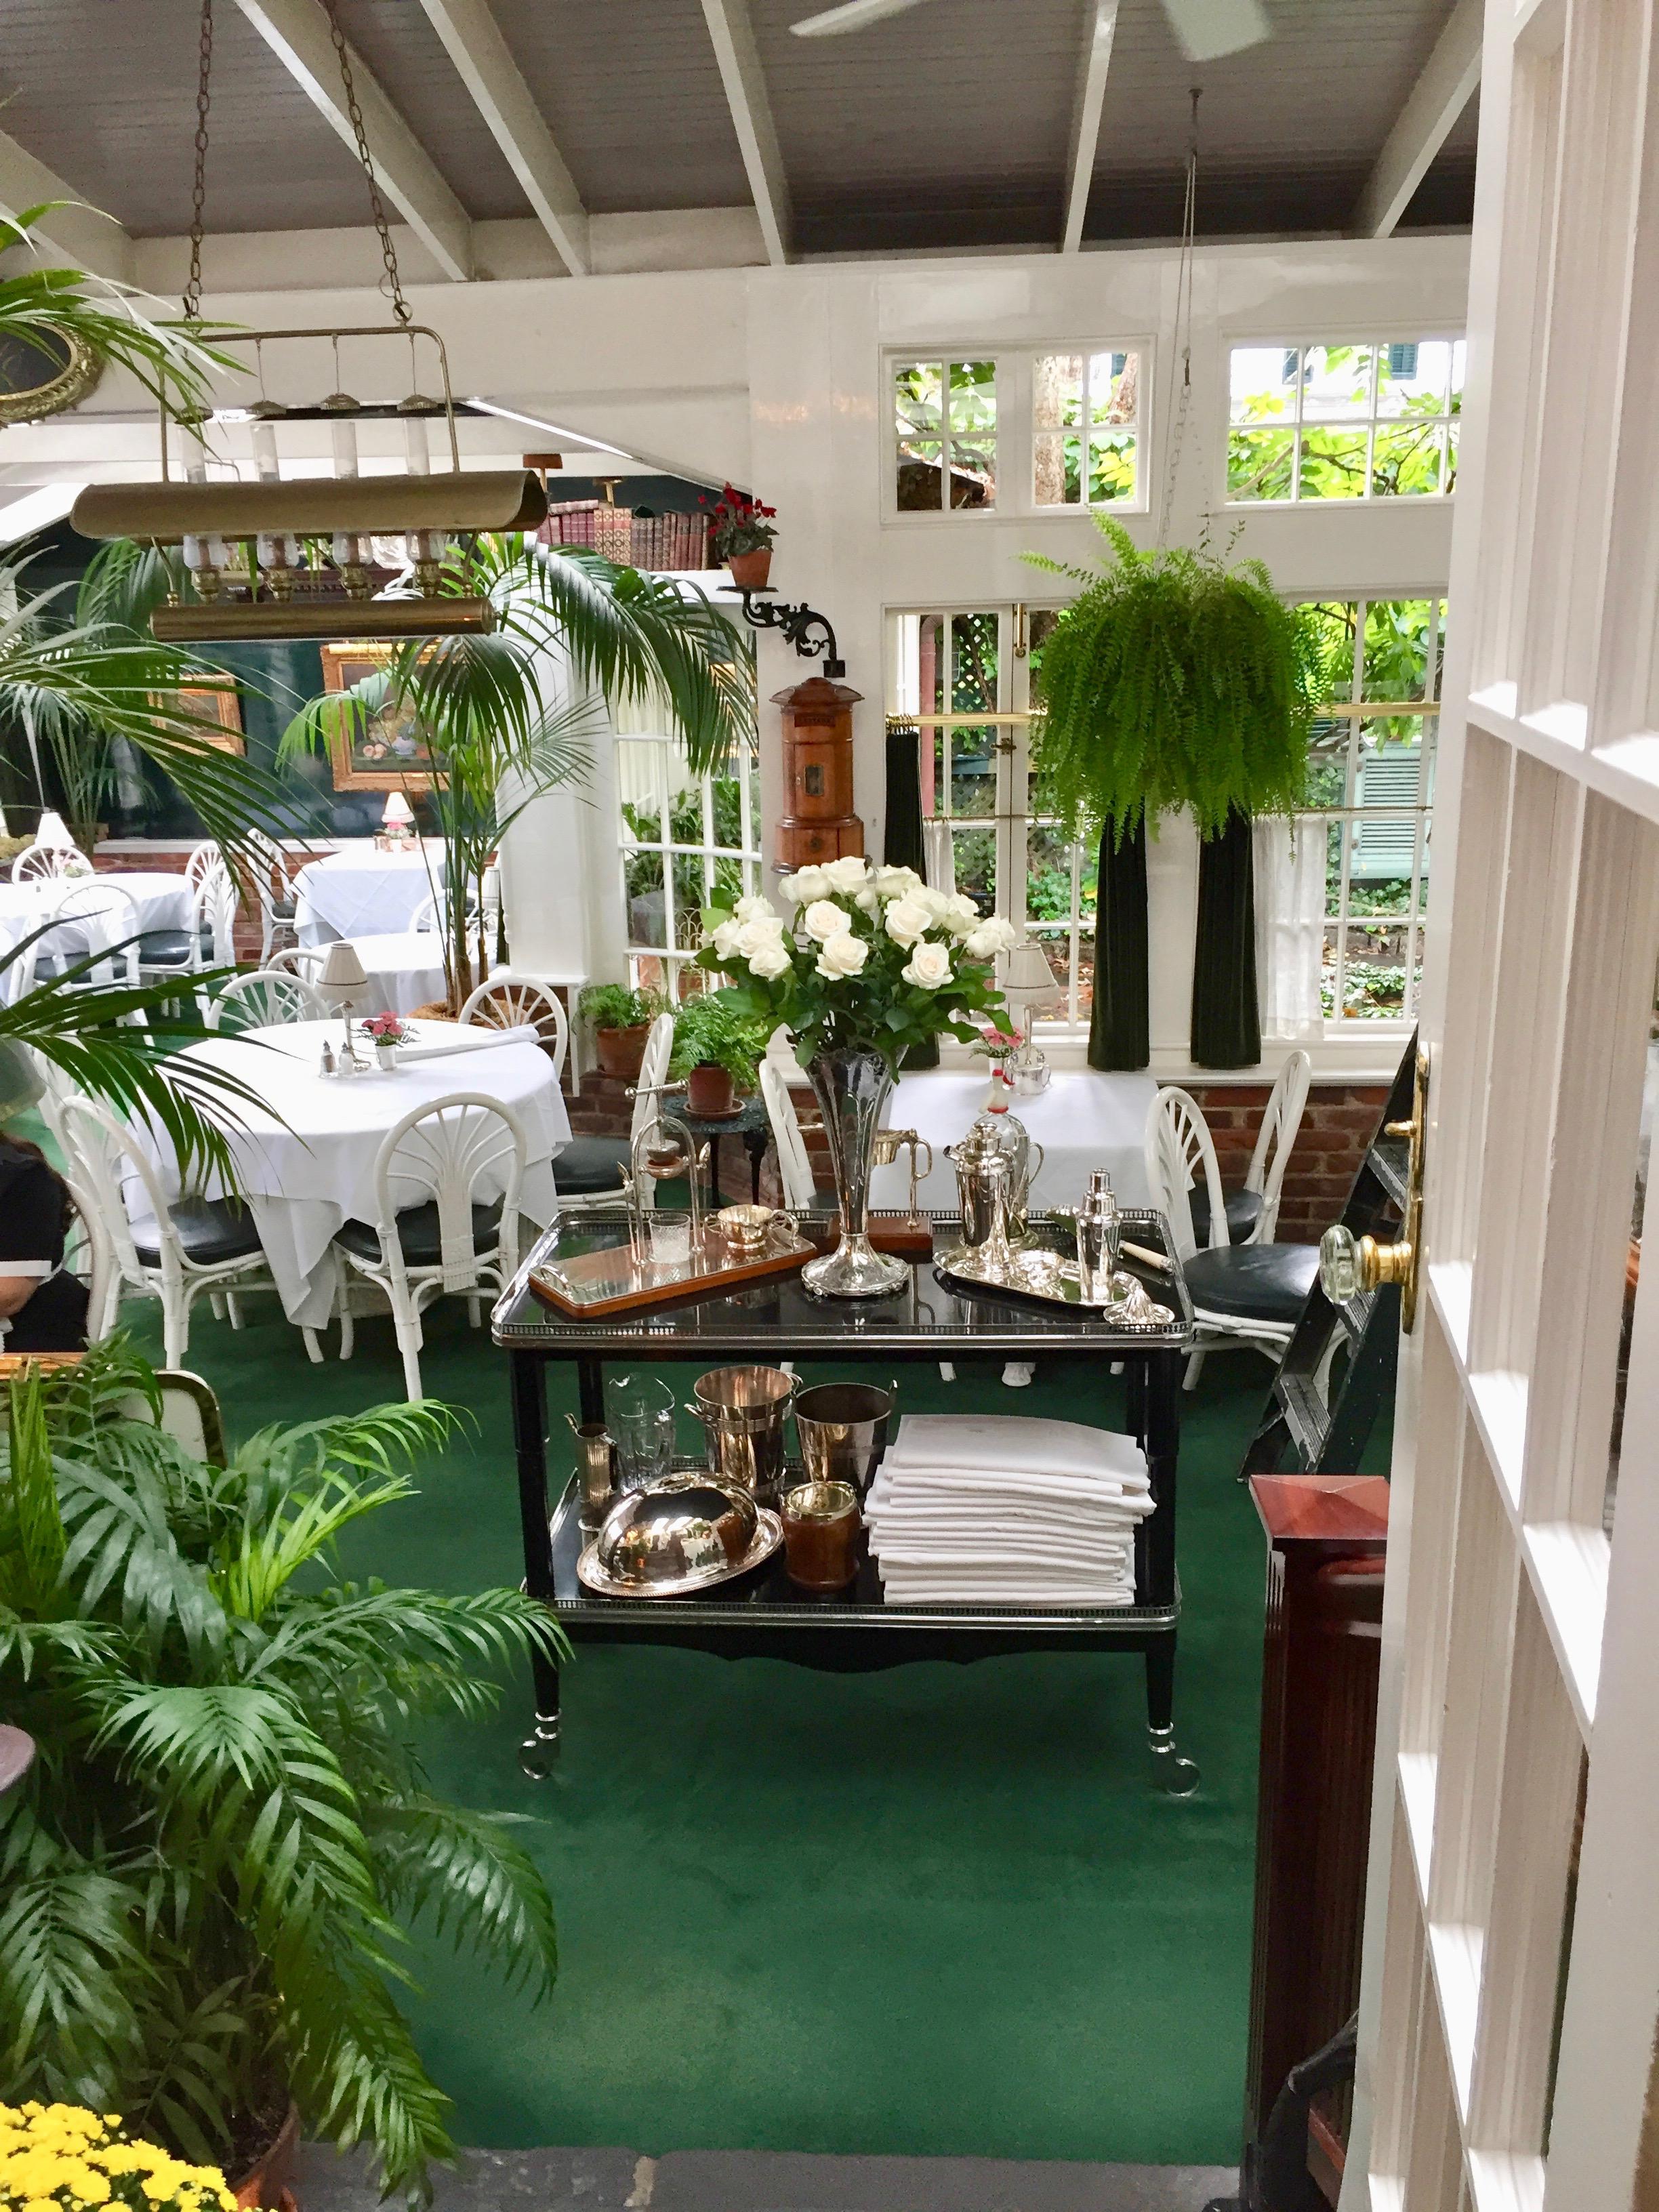 Charlotte Inn Dining space